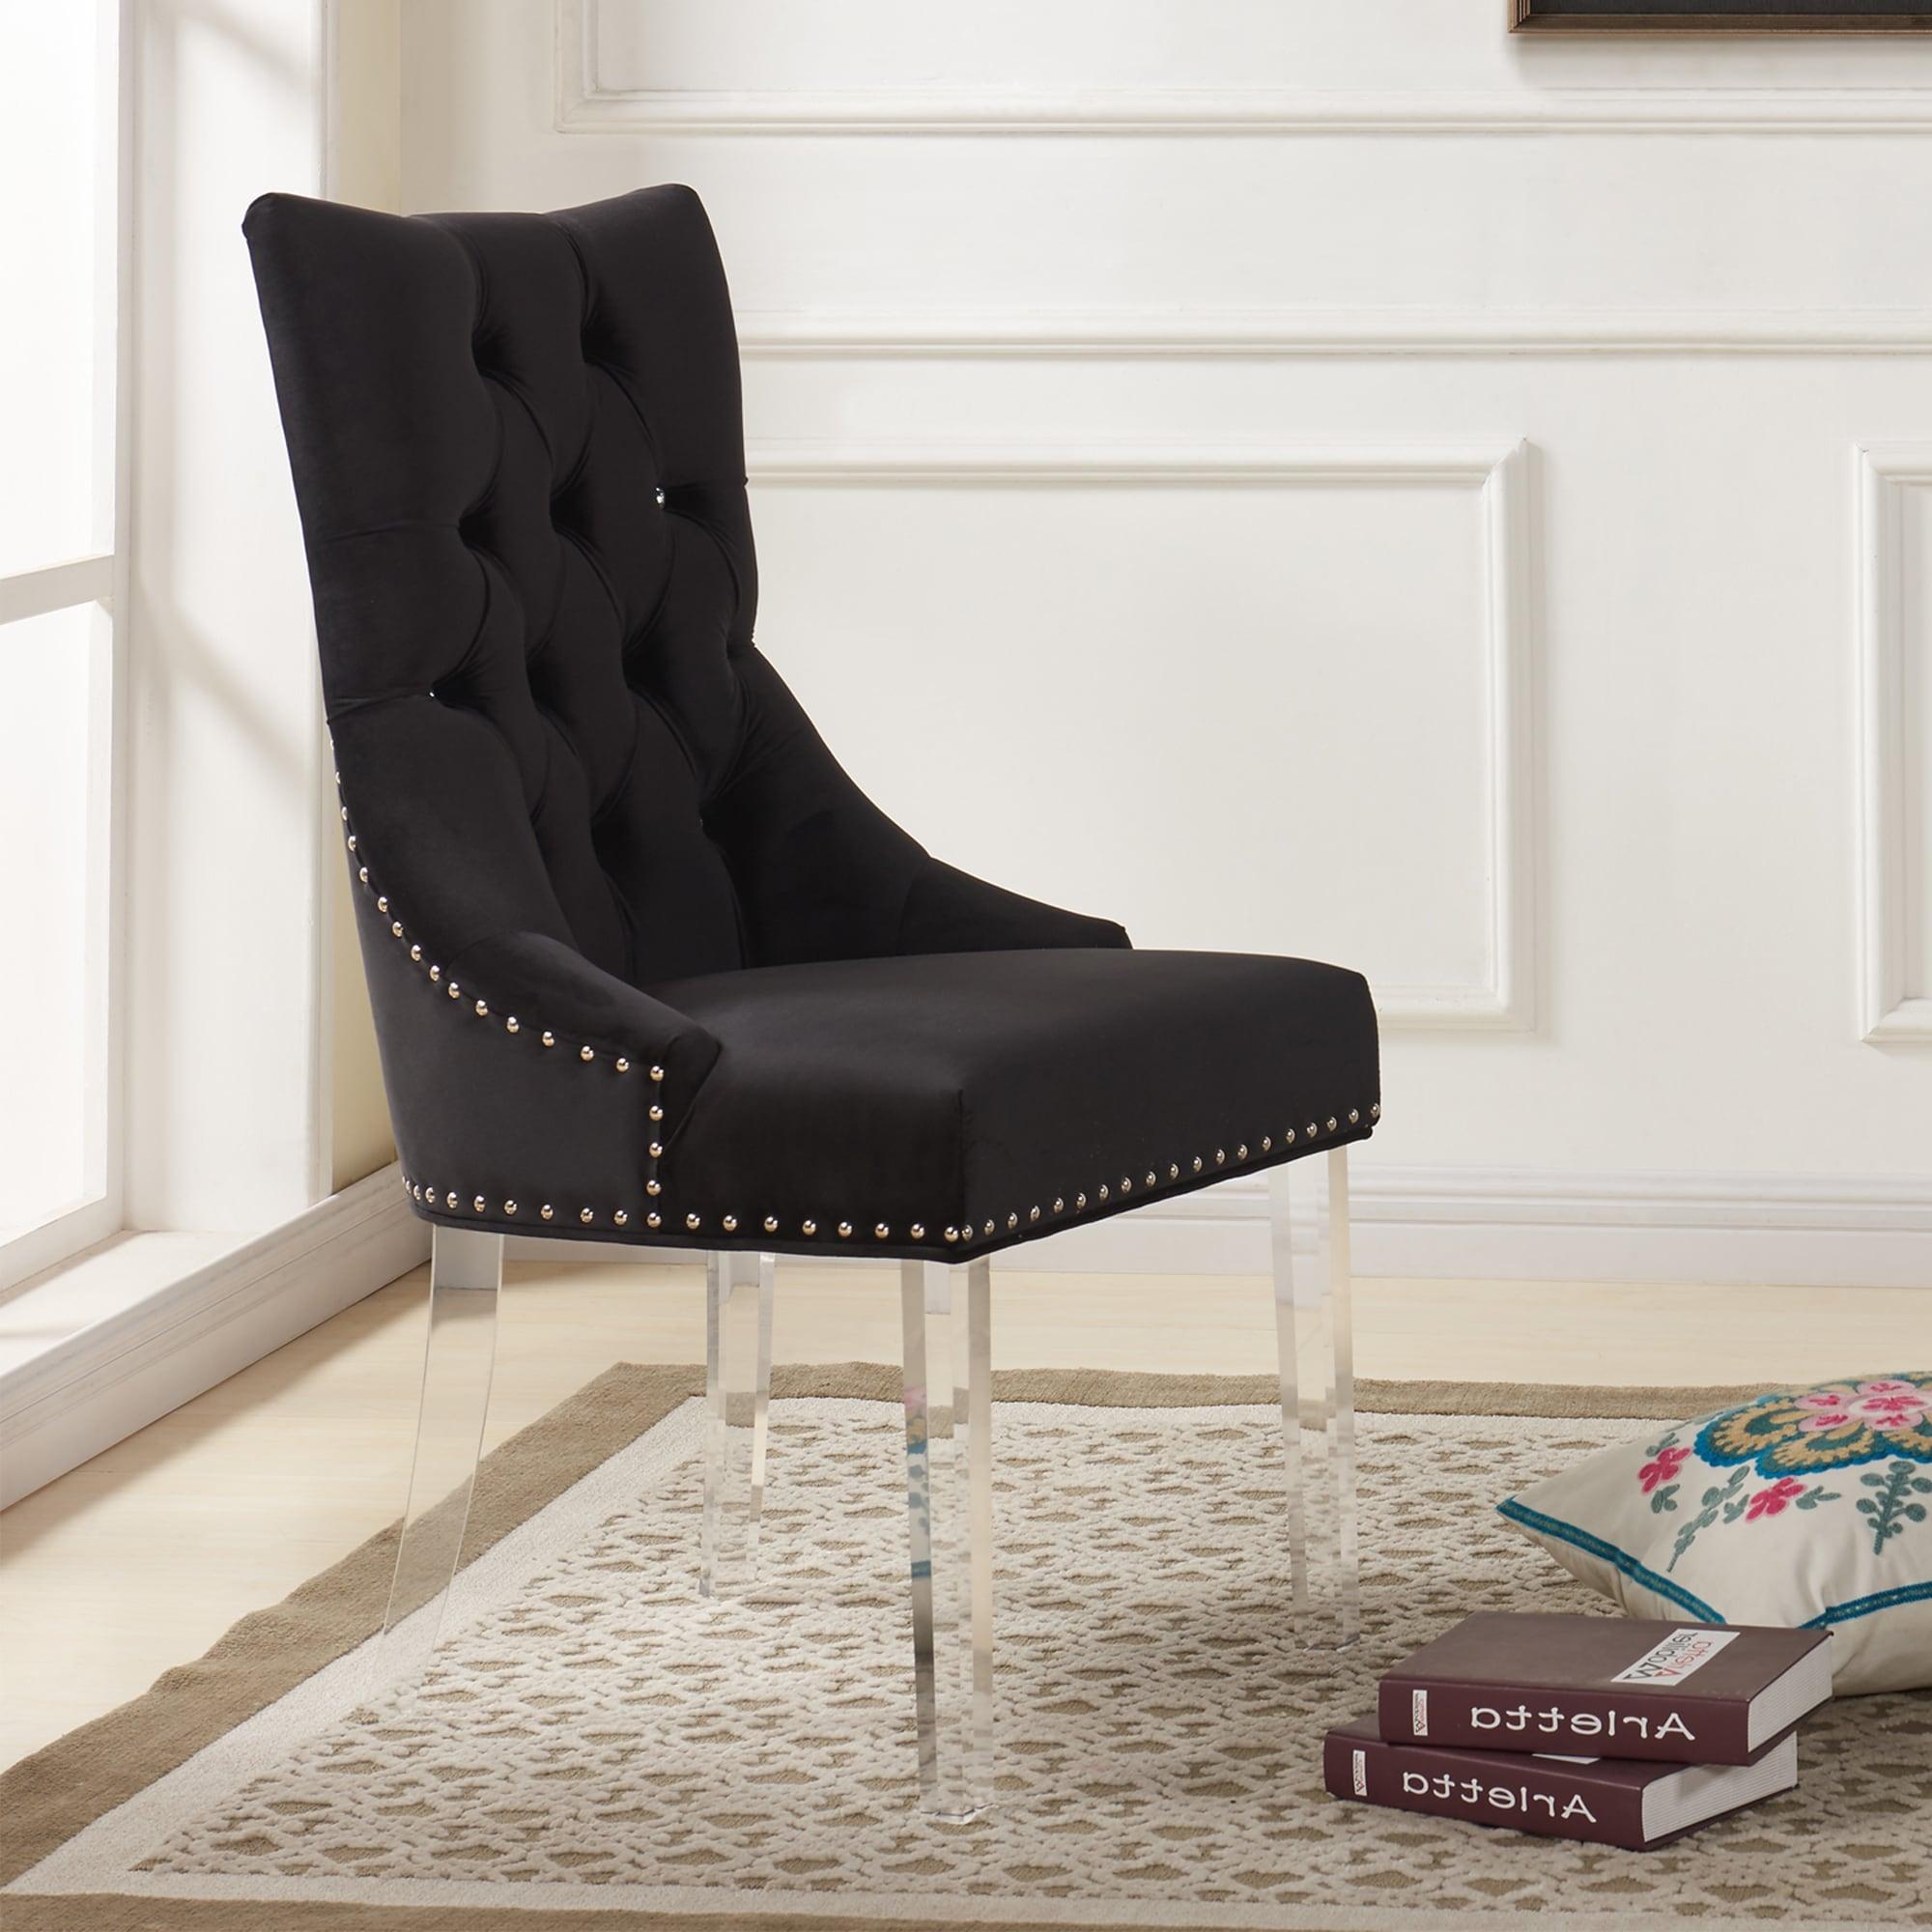 Shop Armen Living Gobi Tufted Dining Chair in Velvet with Acrylic ...